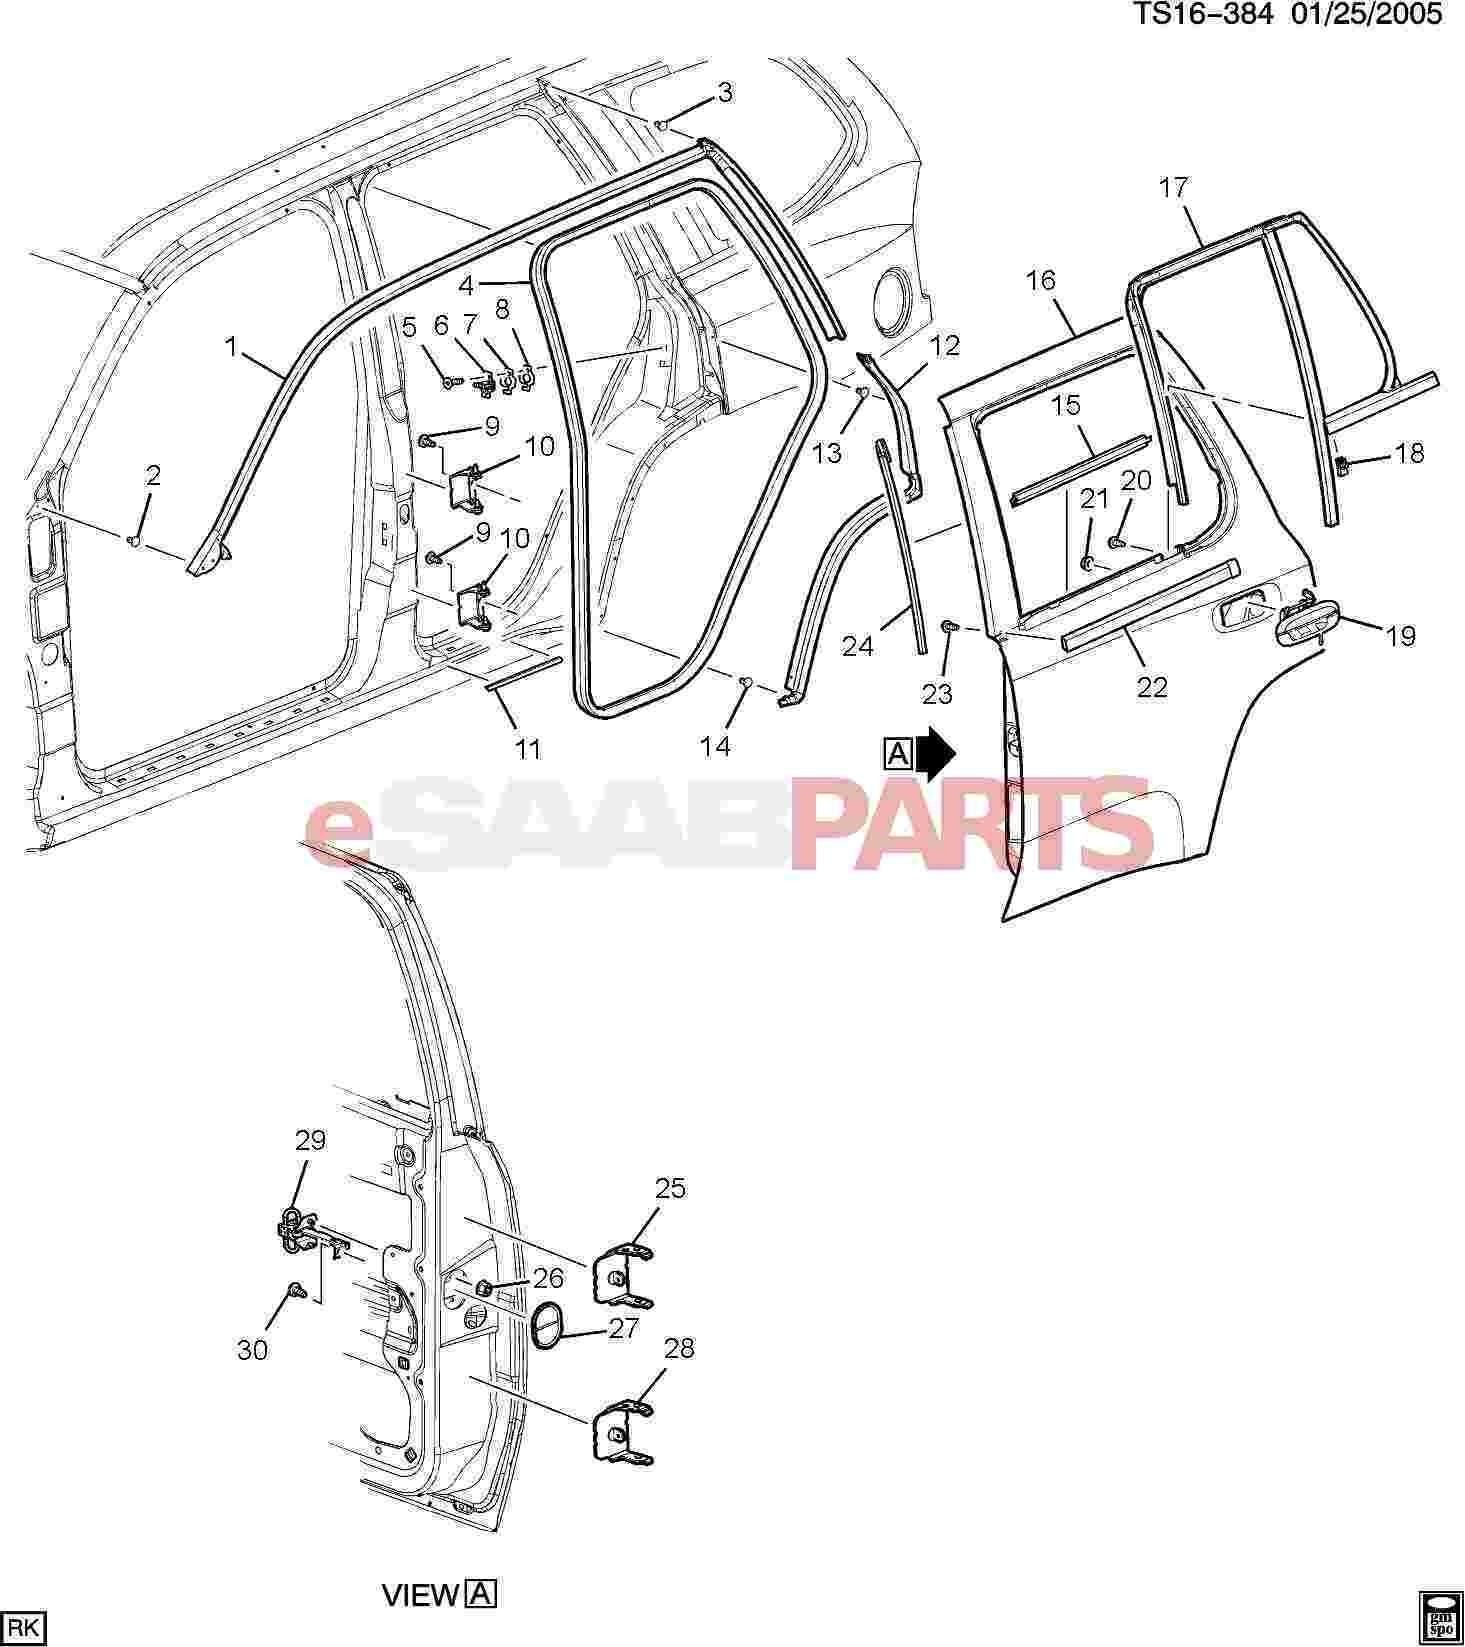 Detailed Diagram Of Car Parts Basic Diagram Car Parts ] Saab Screw Hex with Flat Wa M4 2—1 4—13 Of Detailed Diagram Of Car Parts